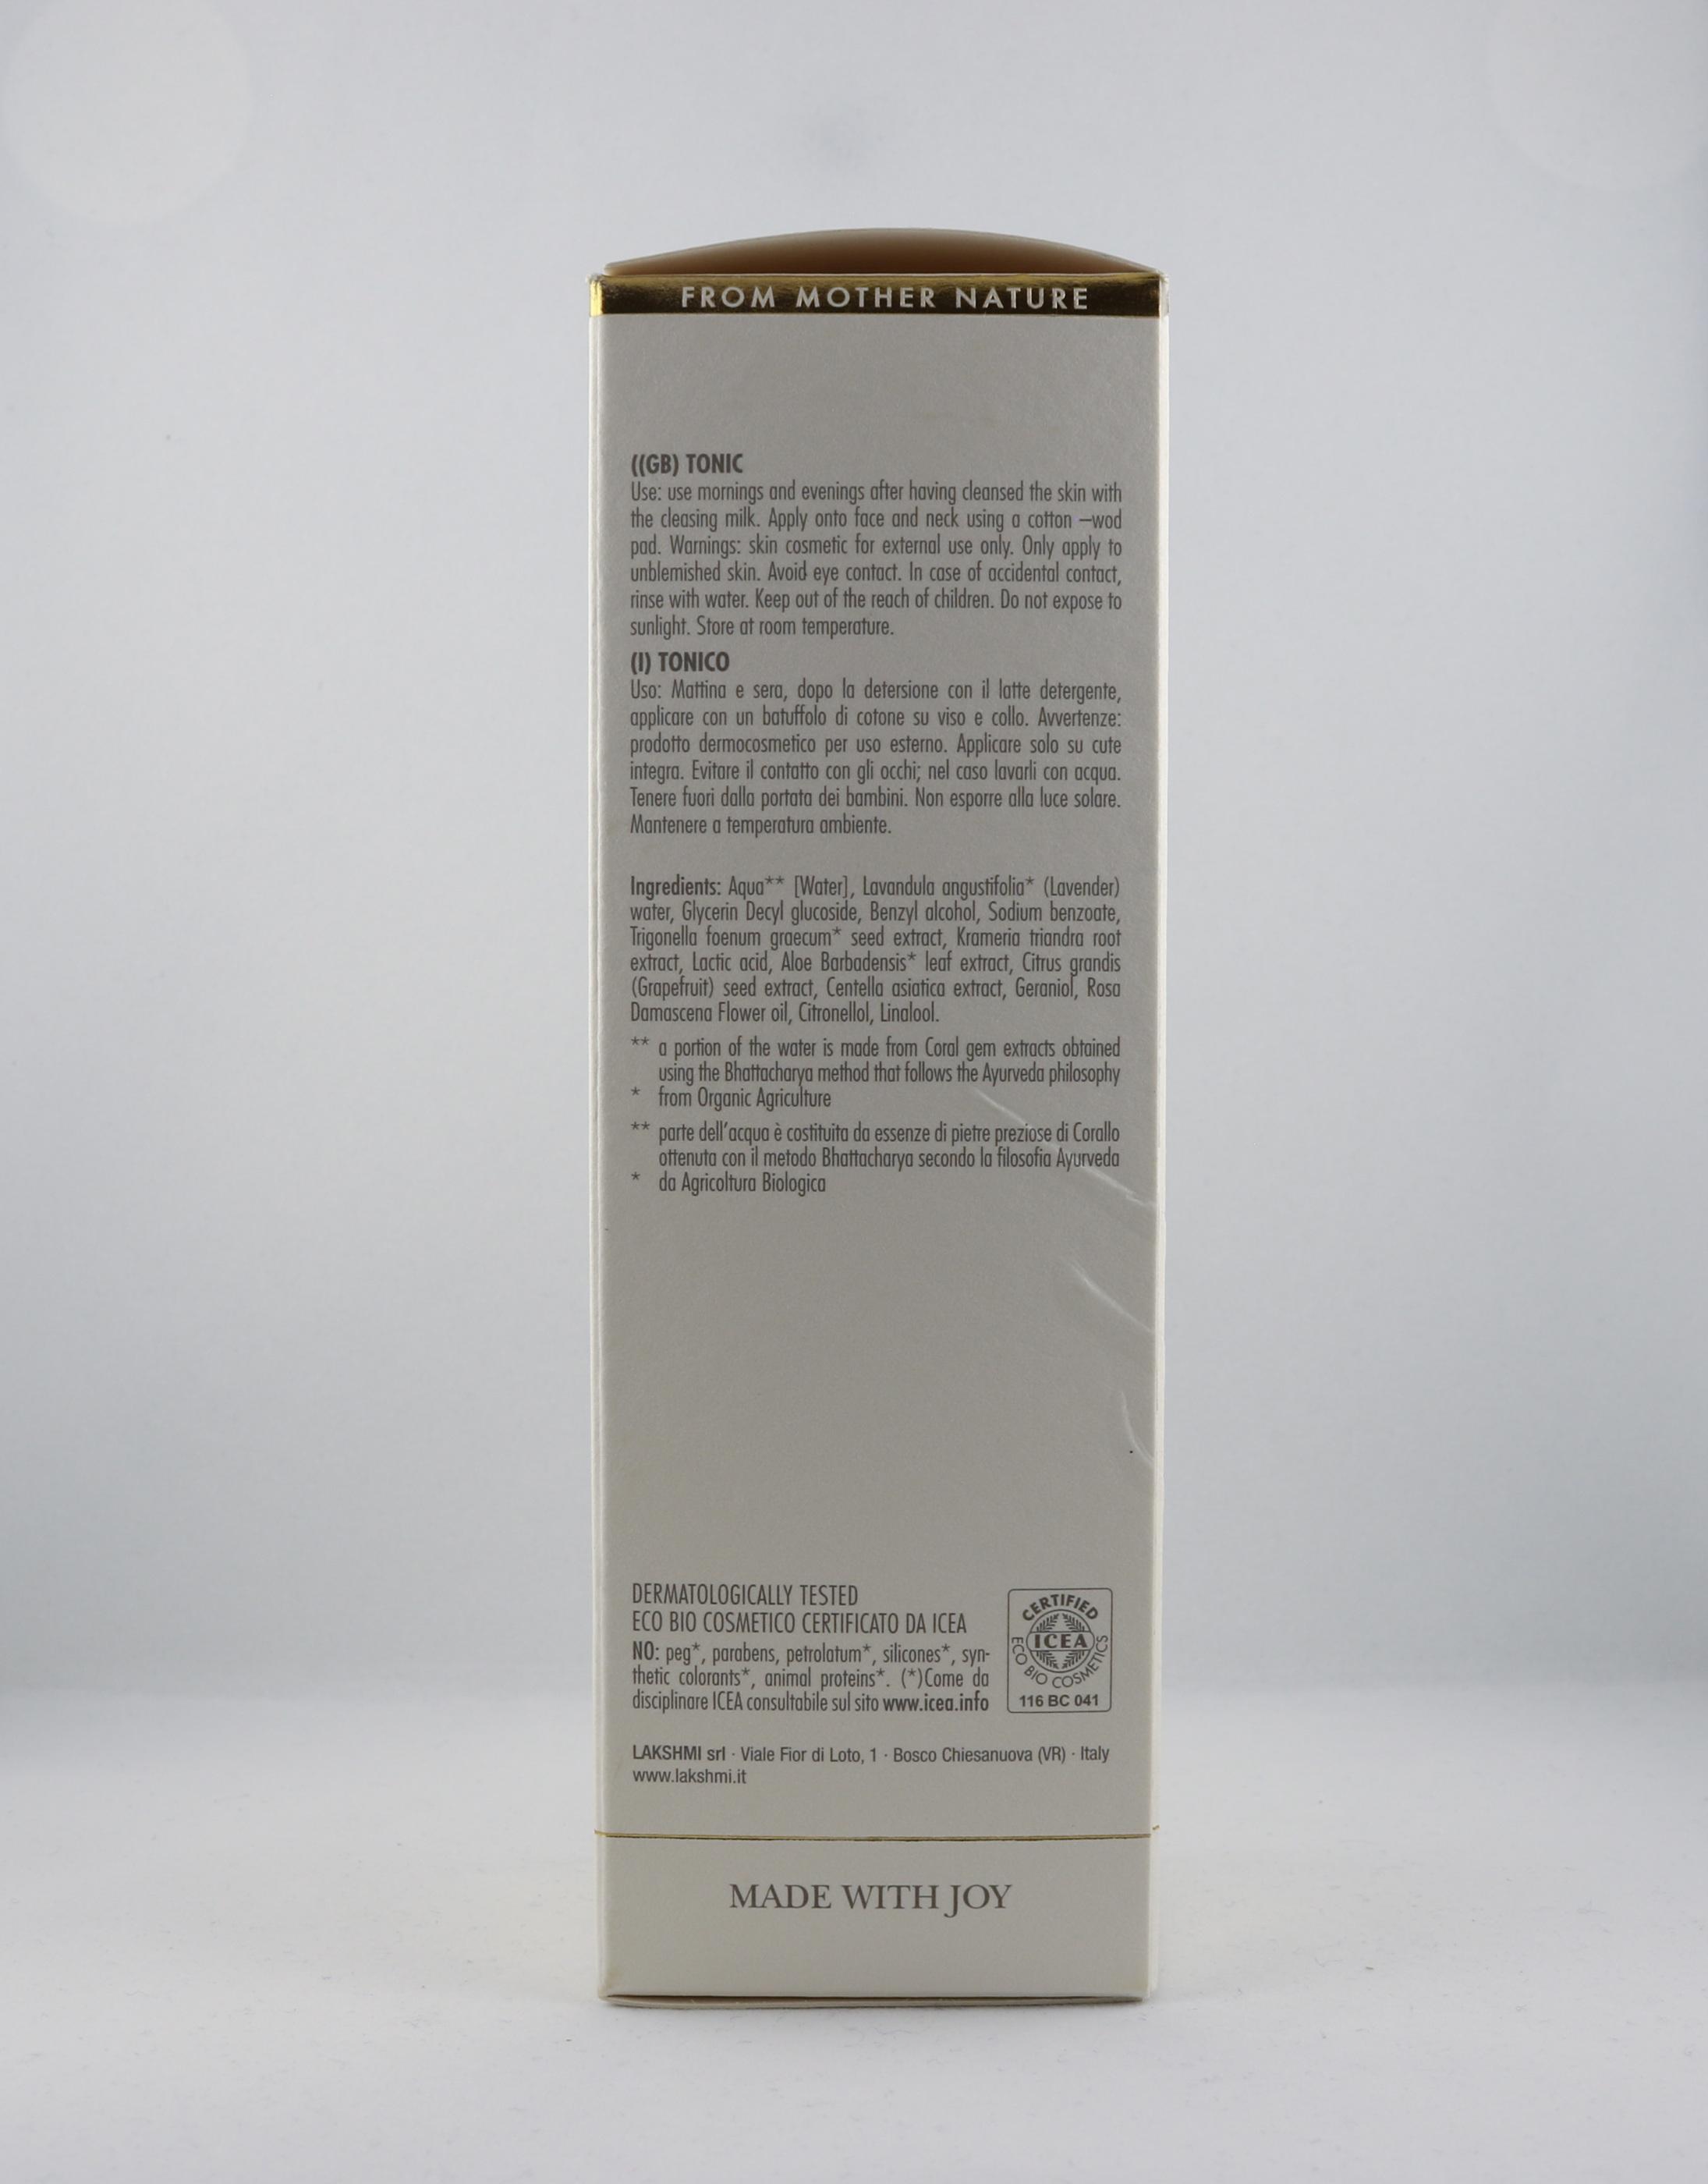 Anti-Age Face Tonic hudvårdsprodukt hudvårdstyp alternativ hälsa wellness ayurveda hudvårdsprodukter